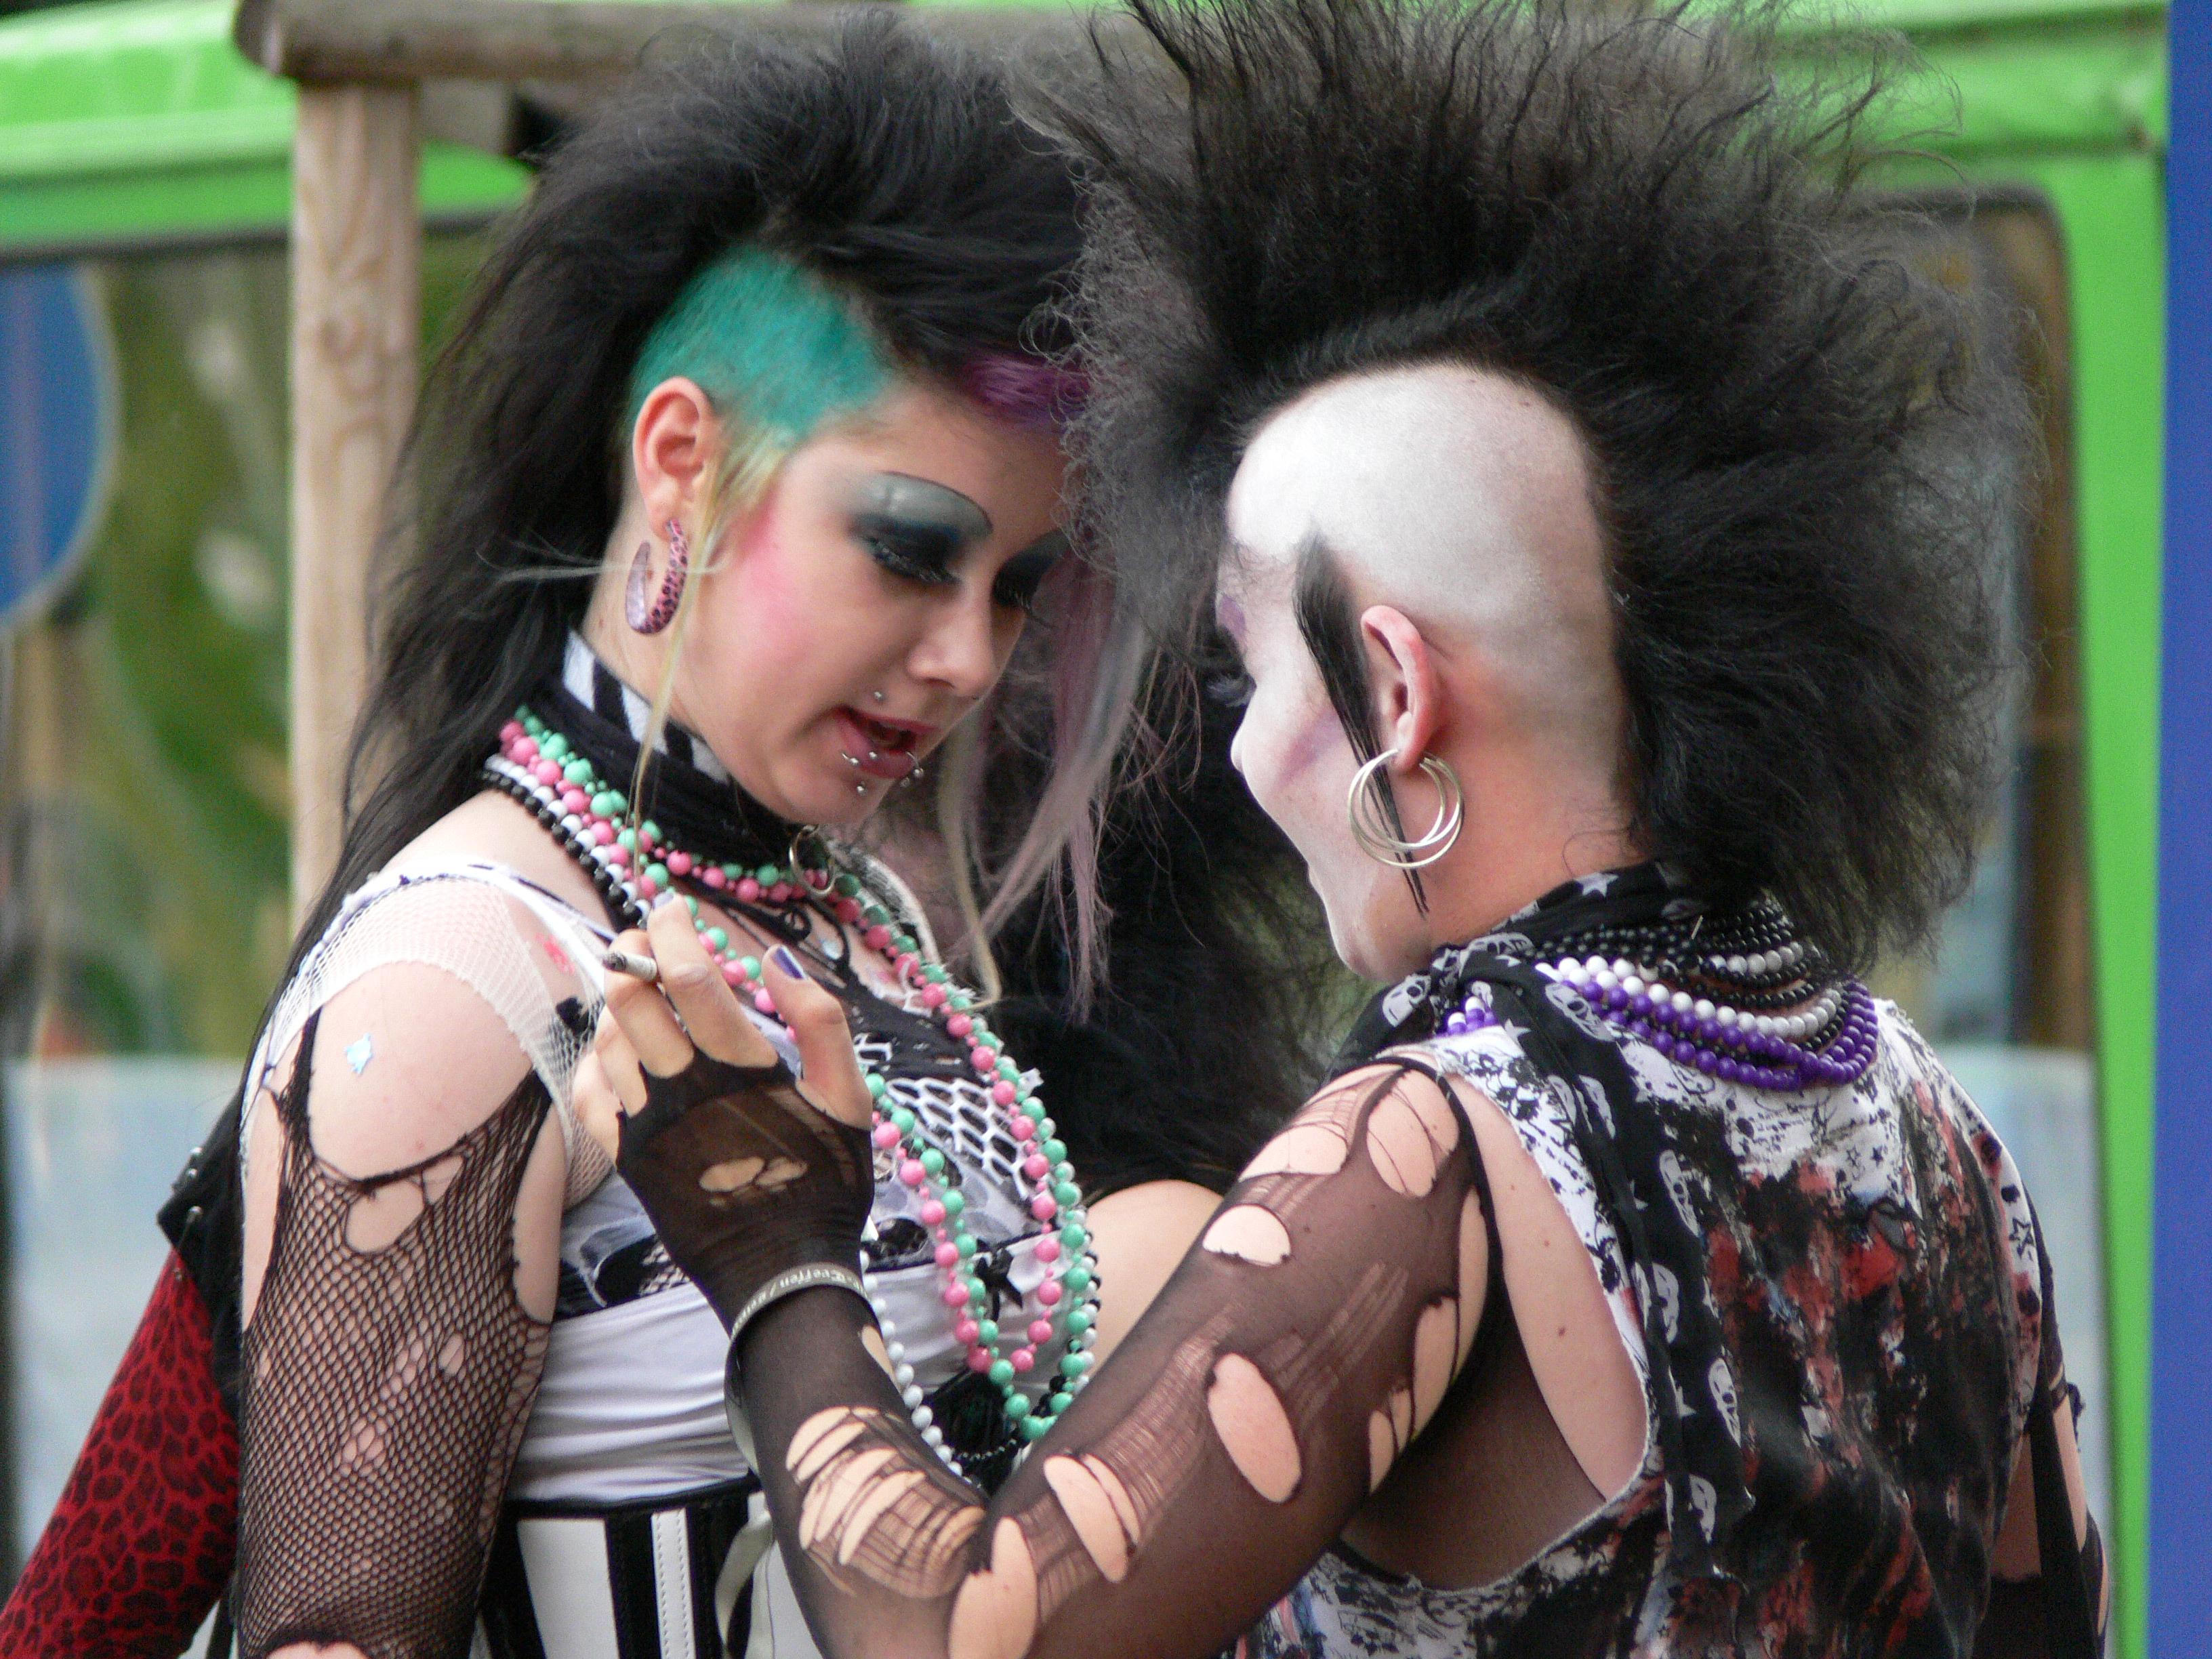 File:Wave Gotik Treffen 2007.jpg - Wikipedia